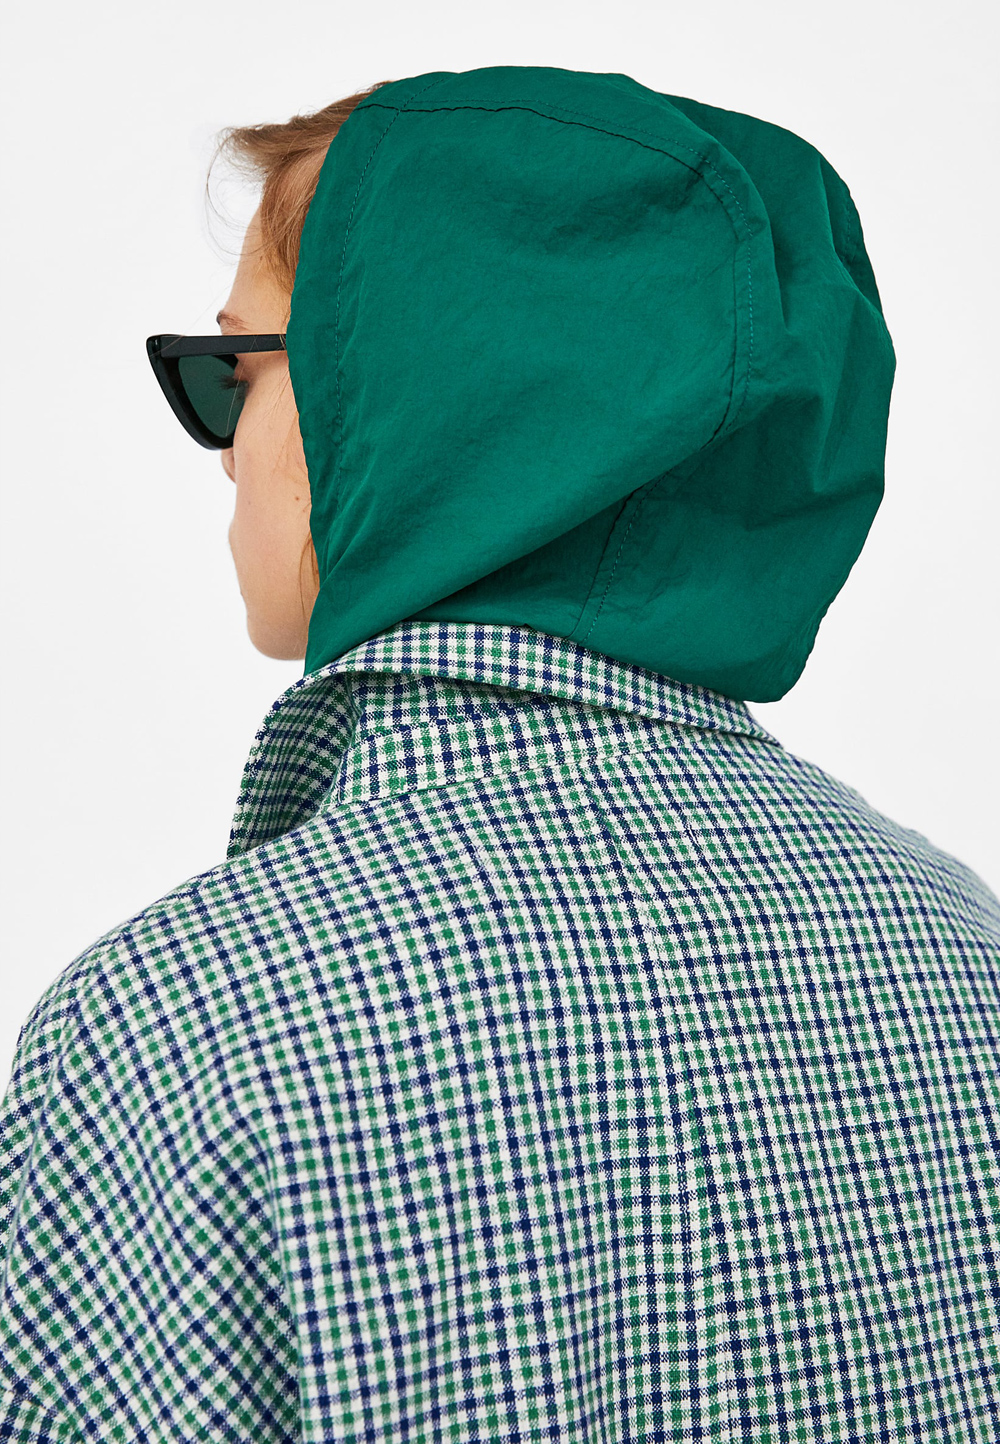 zara-green-checked-coat-with-bows